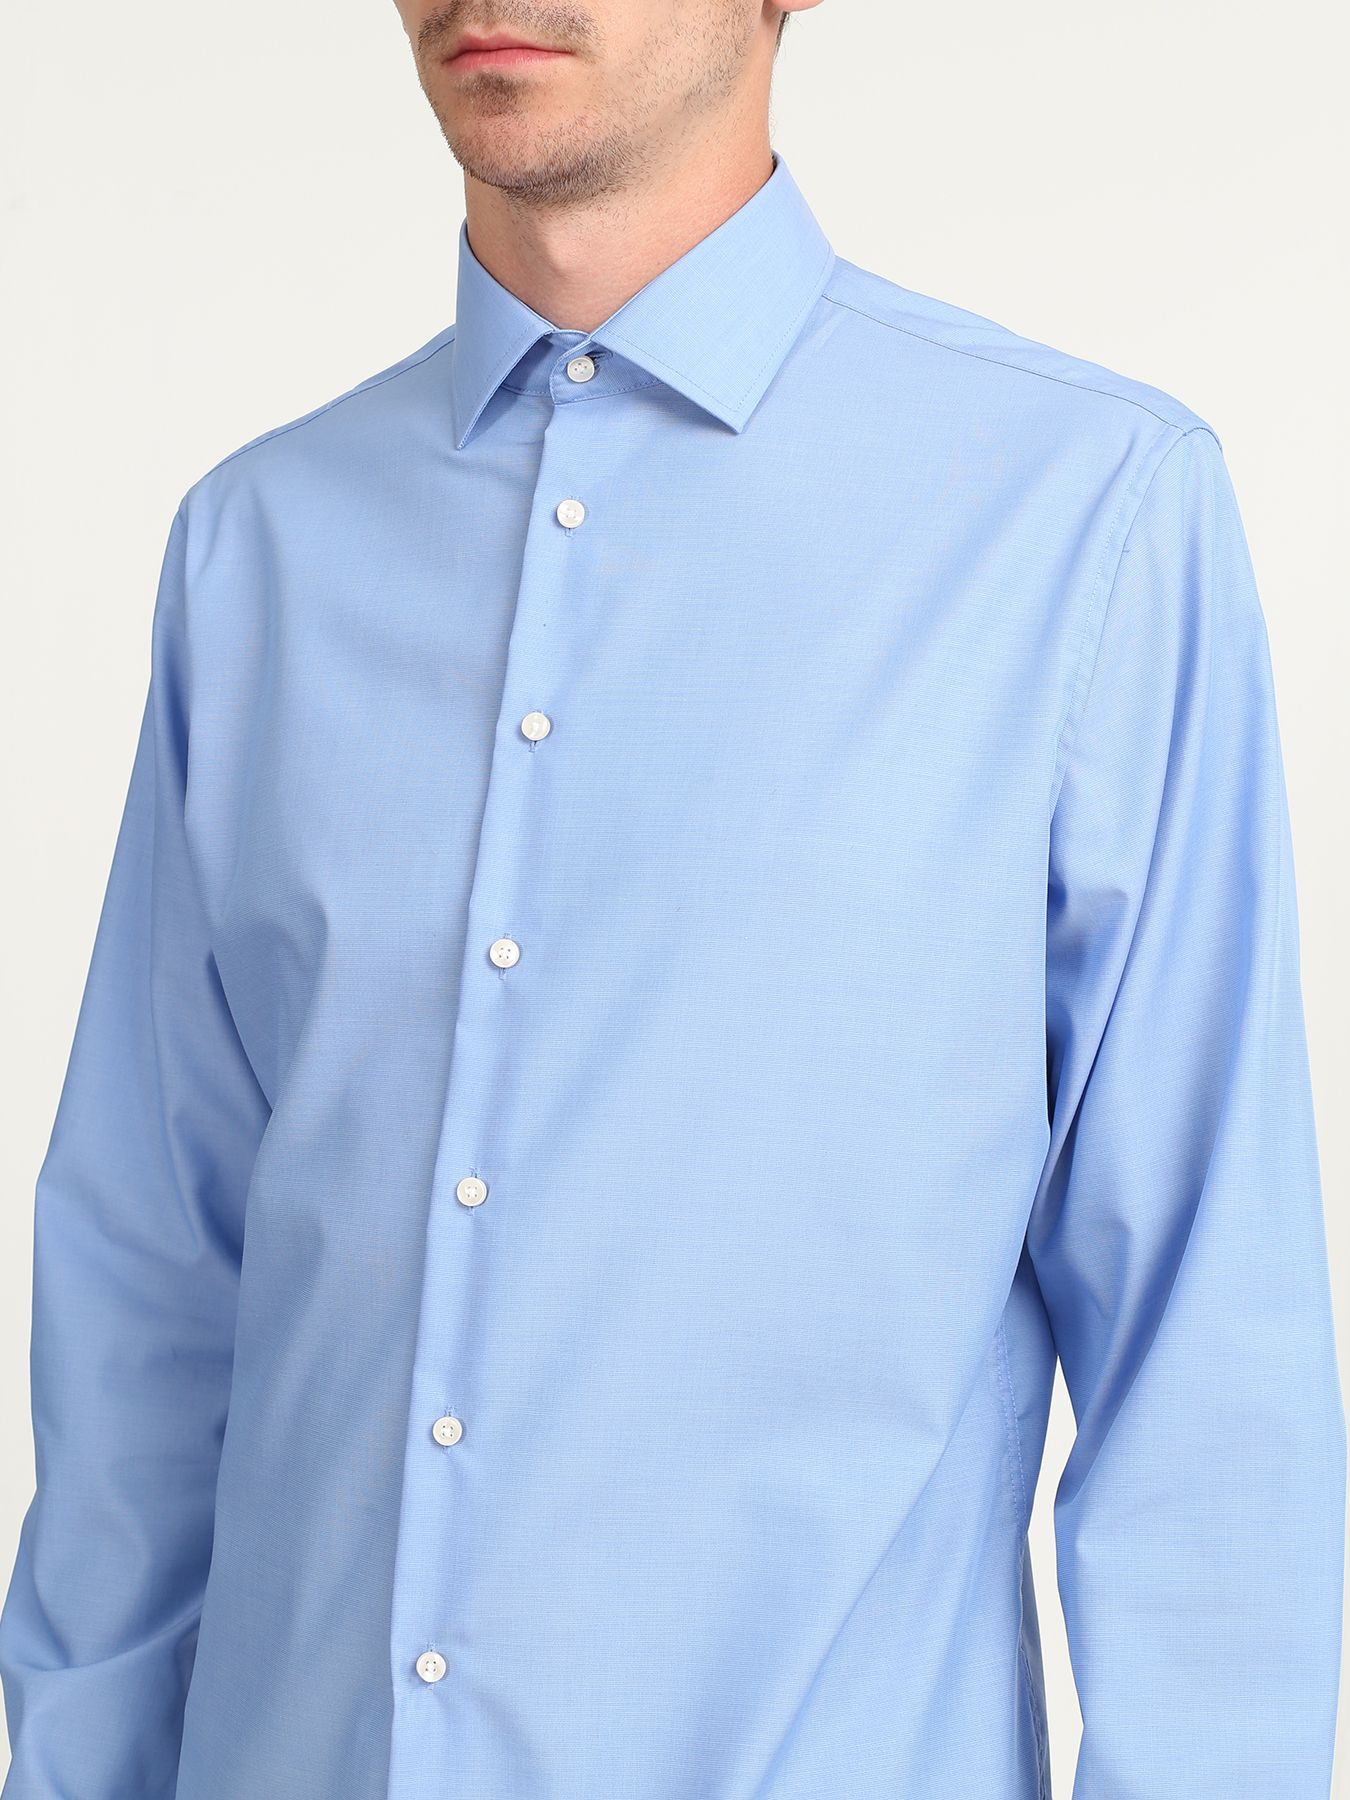 Seidensticker Хлопковая рубашка без карманов 322561-021 Фото 4